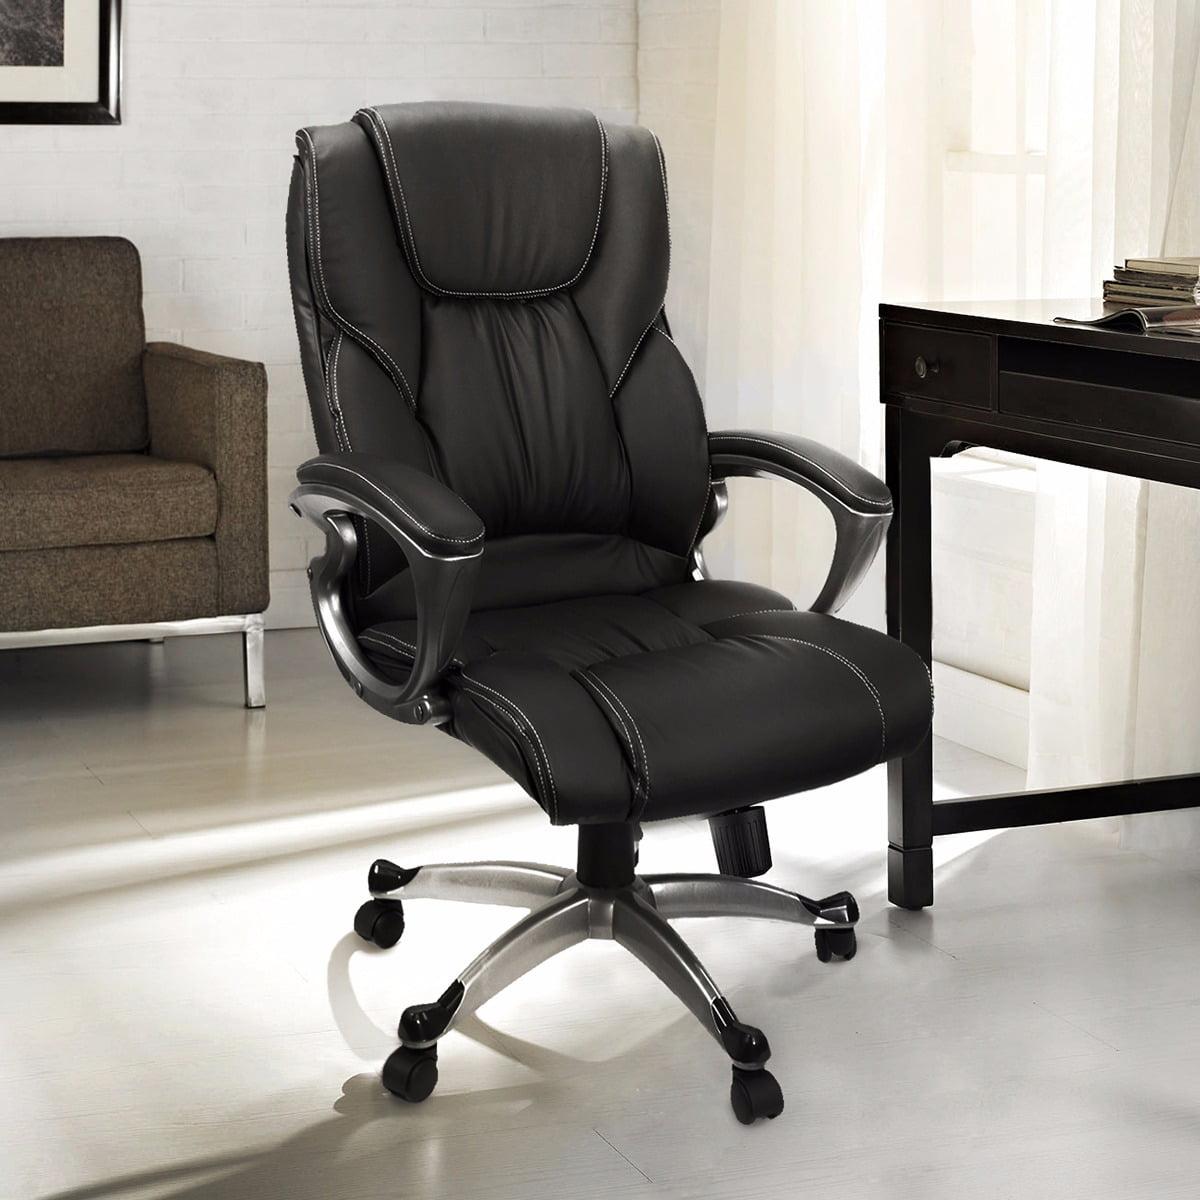 High Back Office Chair PU Leather Executive Ergonomic Swivel Lift, Black